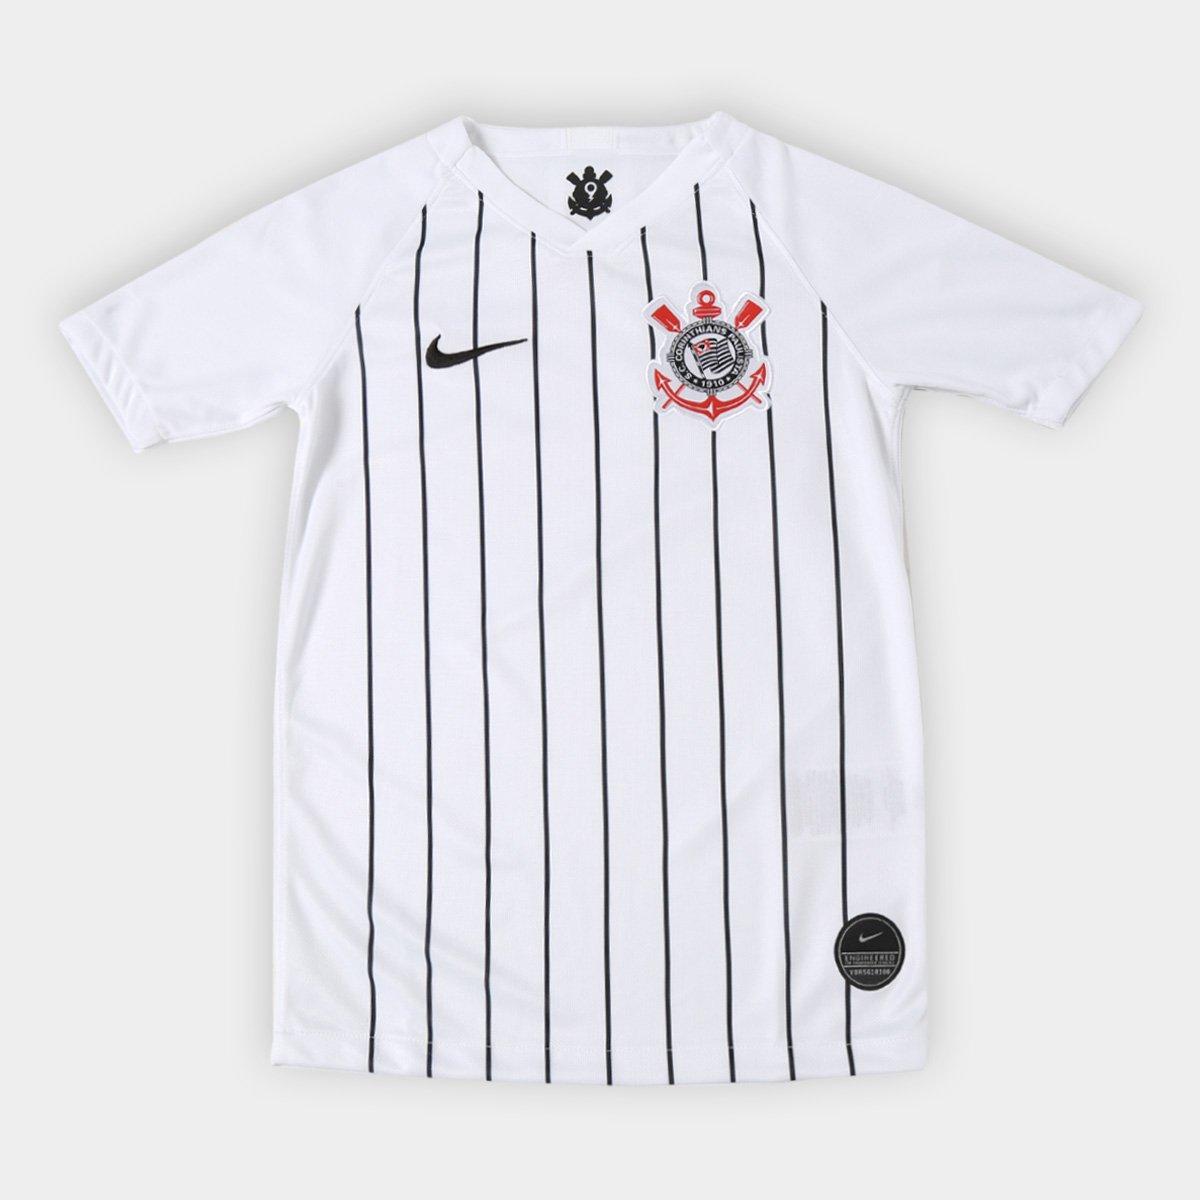 eeeb6d5dbde7f Camisa Corinthians Infantil I 19/20 s/nº Torcedor Nike - Branco e Preto    Shop Timão